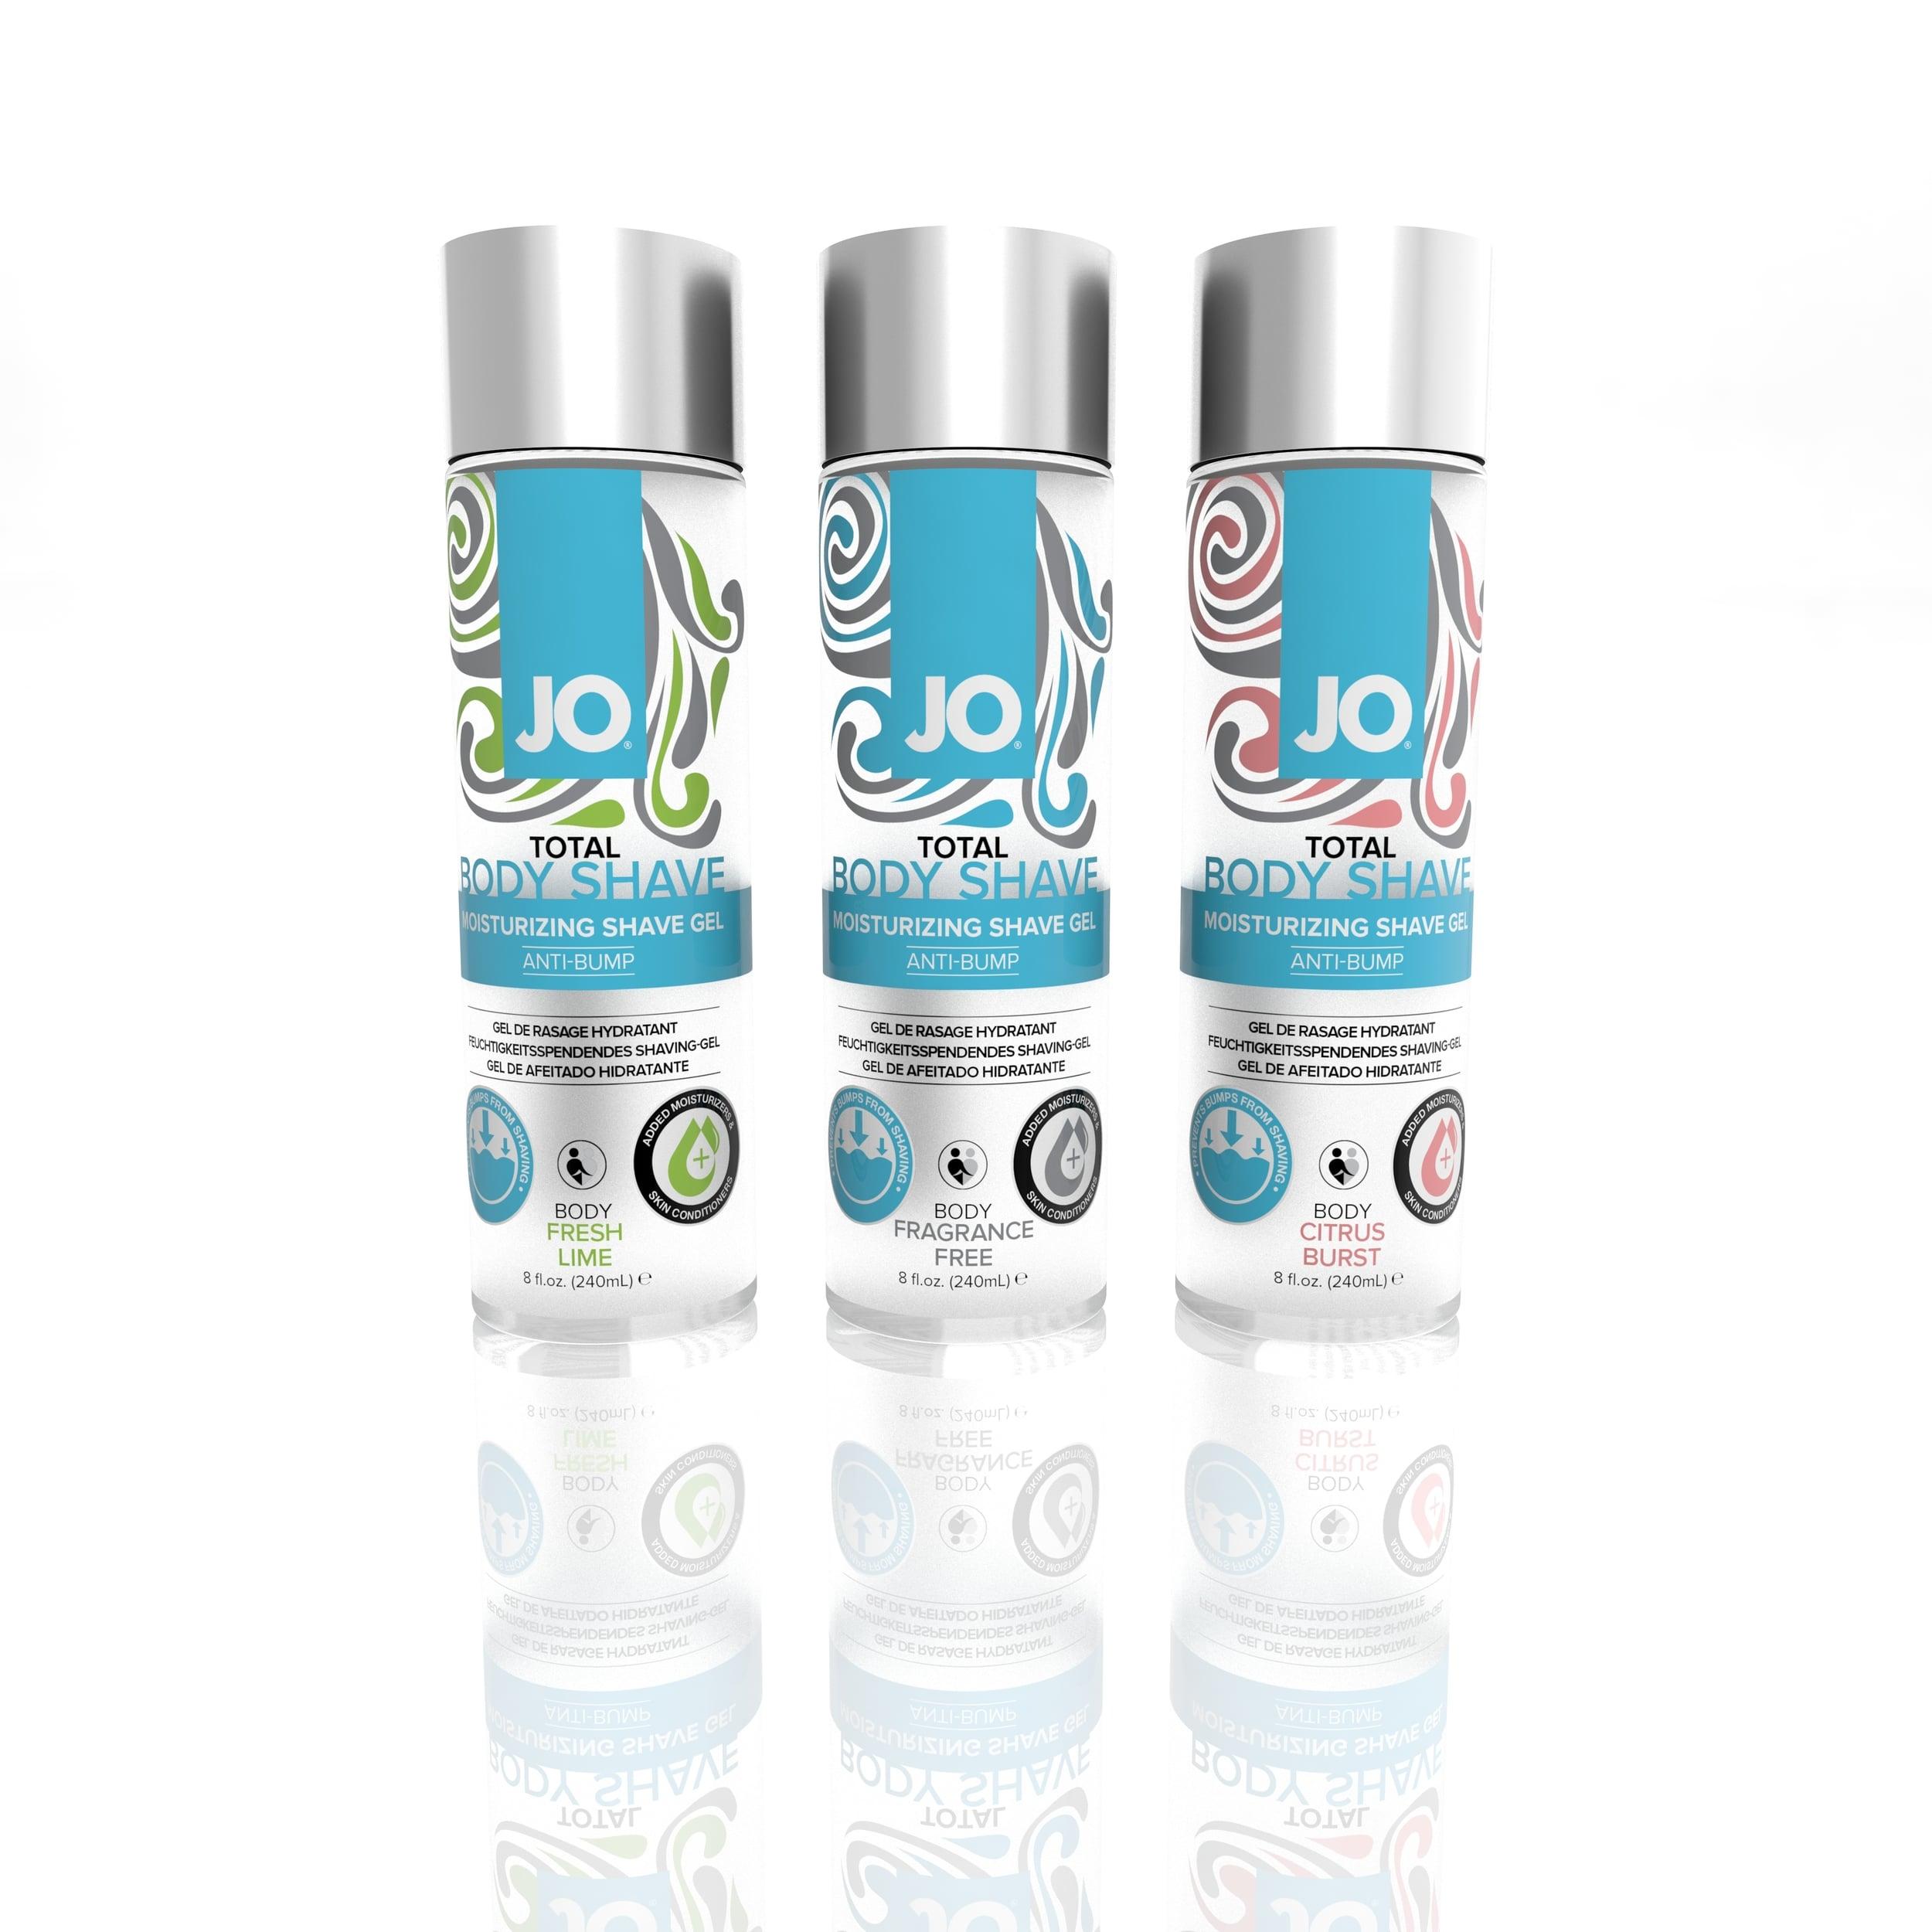 JO Total Body Shave Gel 8oz Lineup.jpg